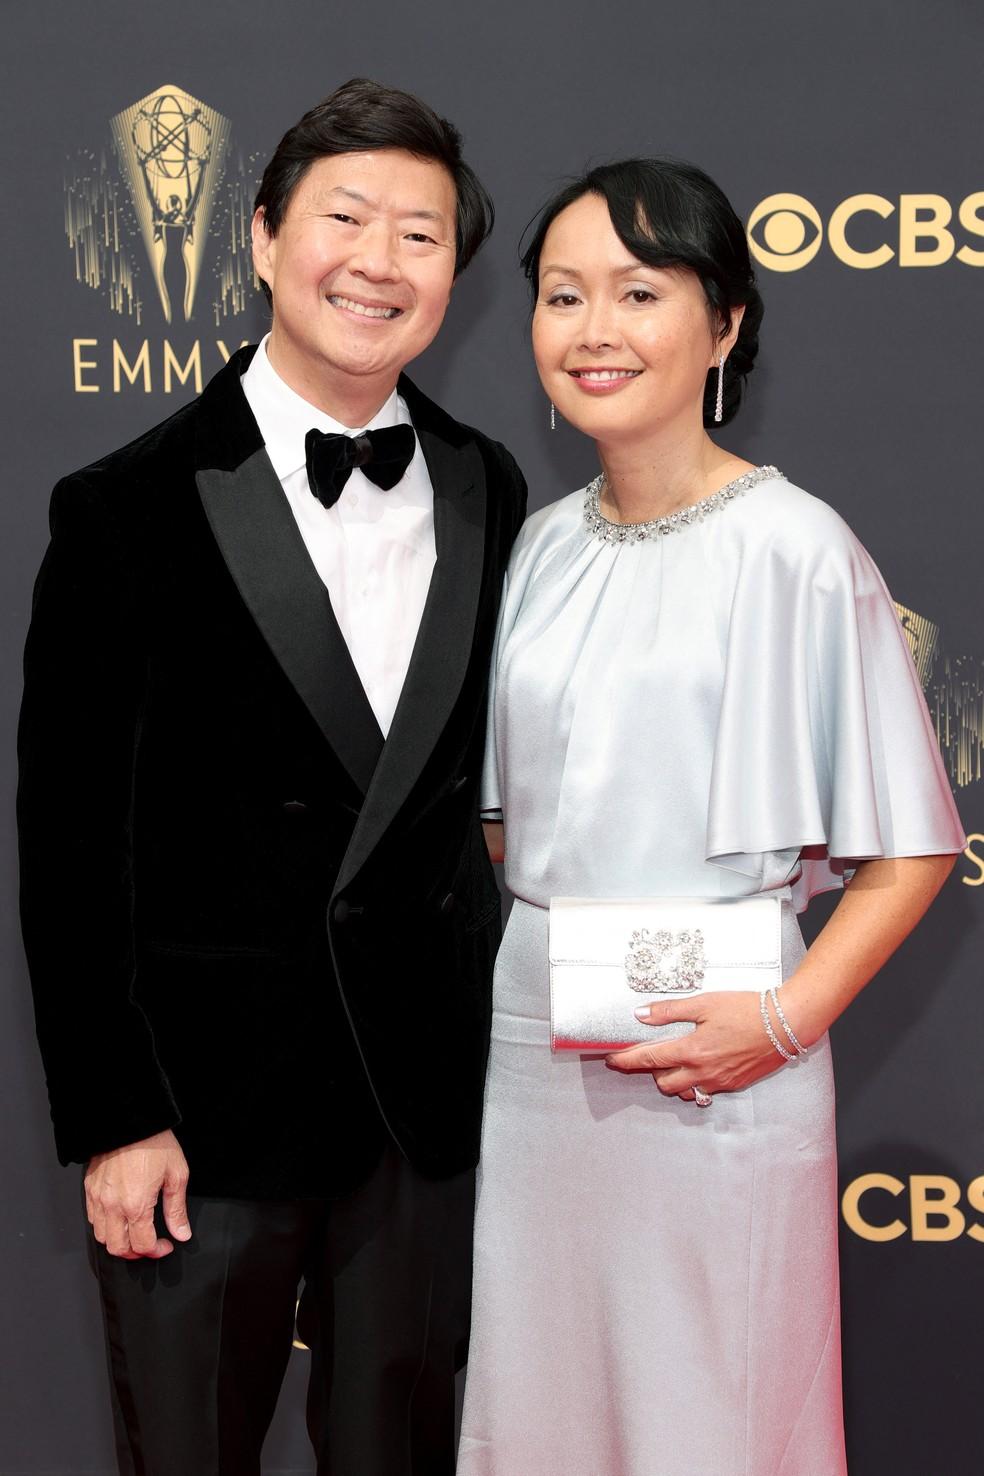 Ken e Tran Jeong chegam ao Emmy 2021 — Foto: Rich Fury/Getty Images North America/Getty Images via AFP